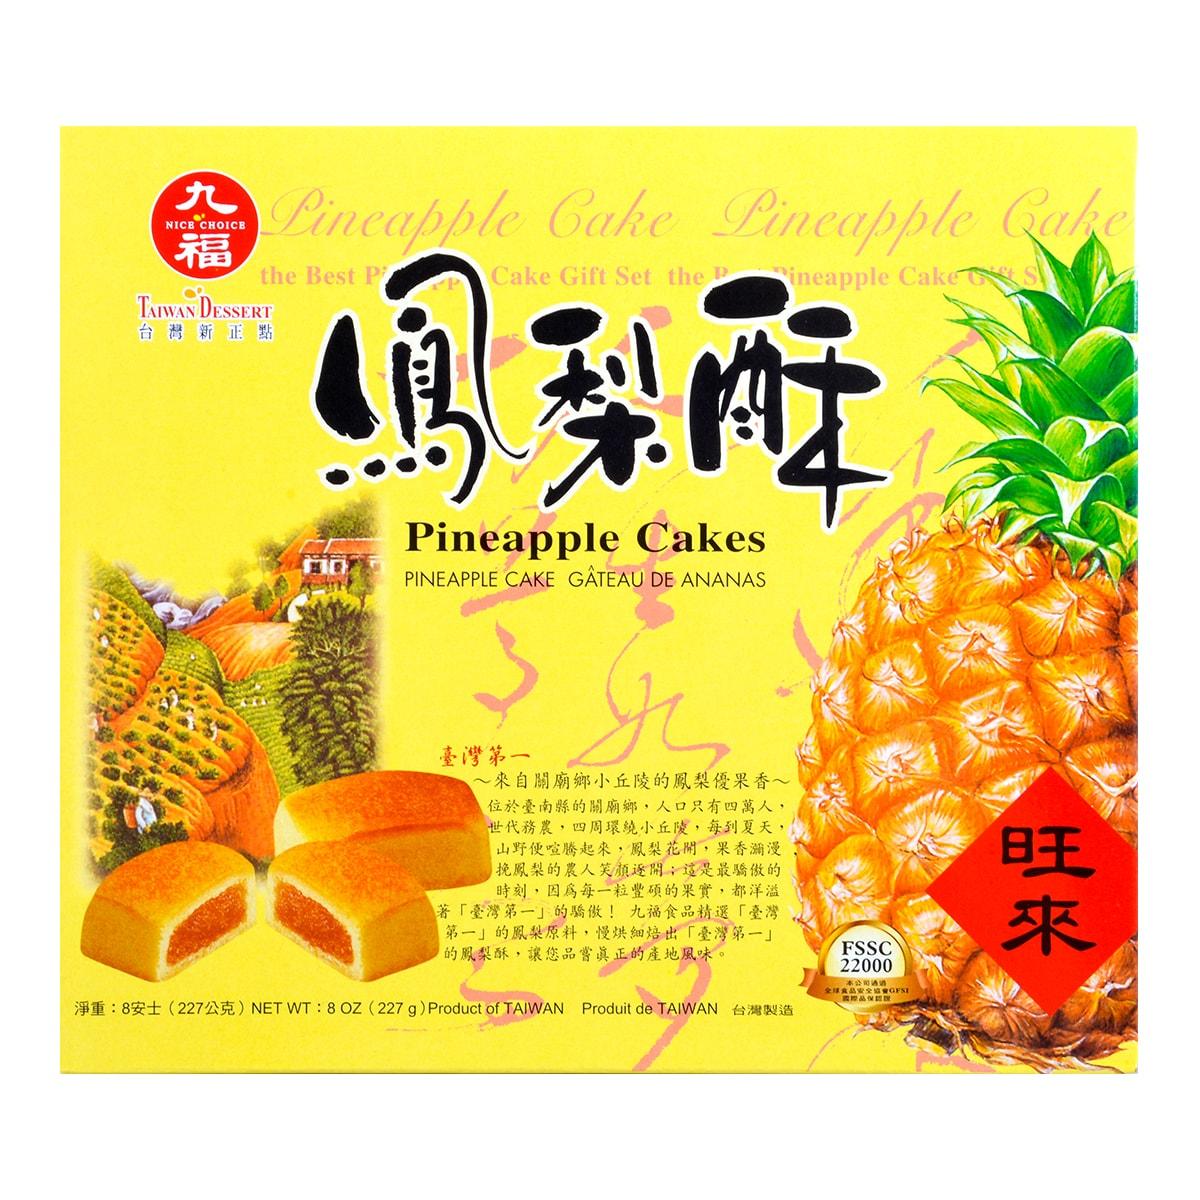 NICE CHOICE Taiwan Pineapple Cake 227g